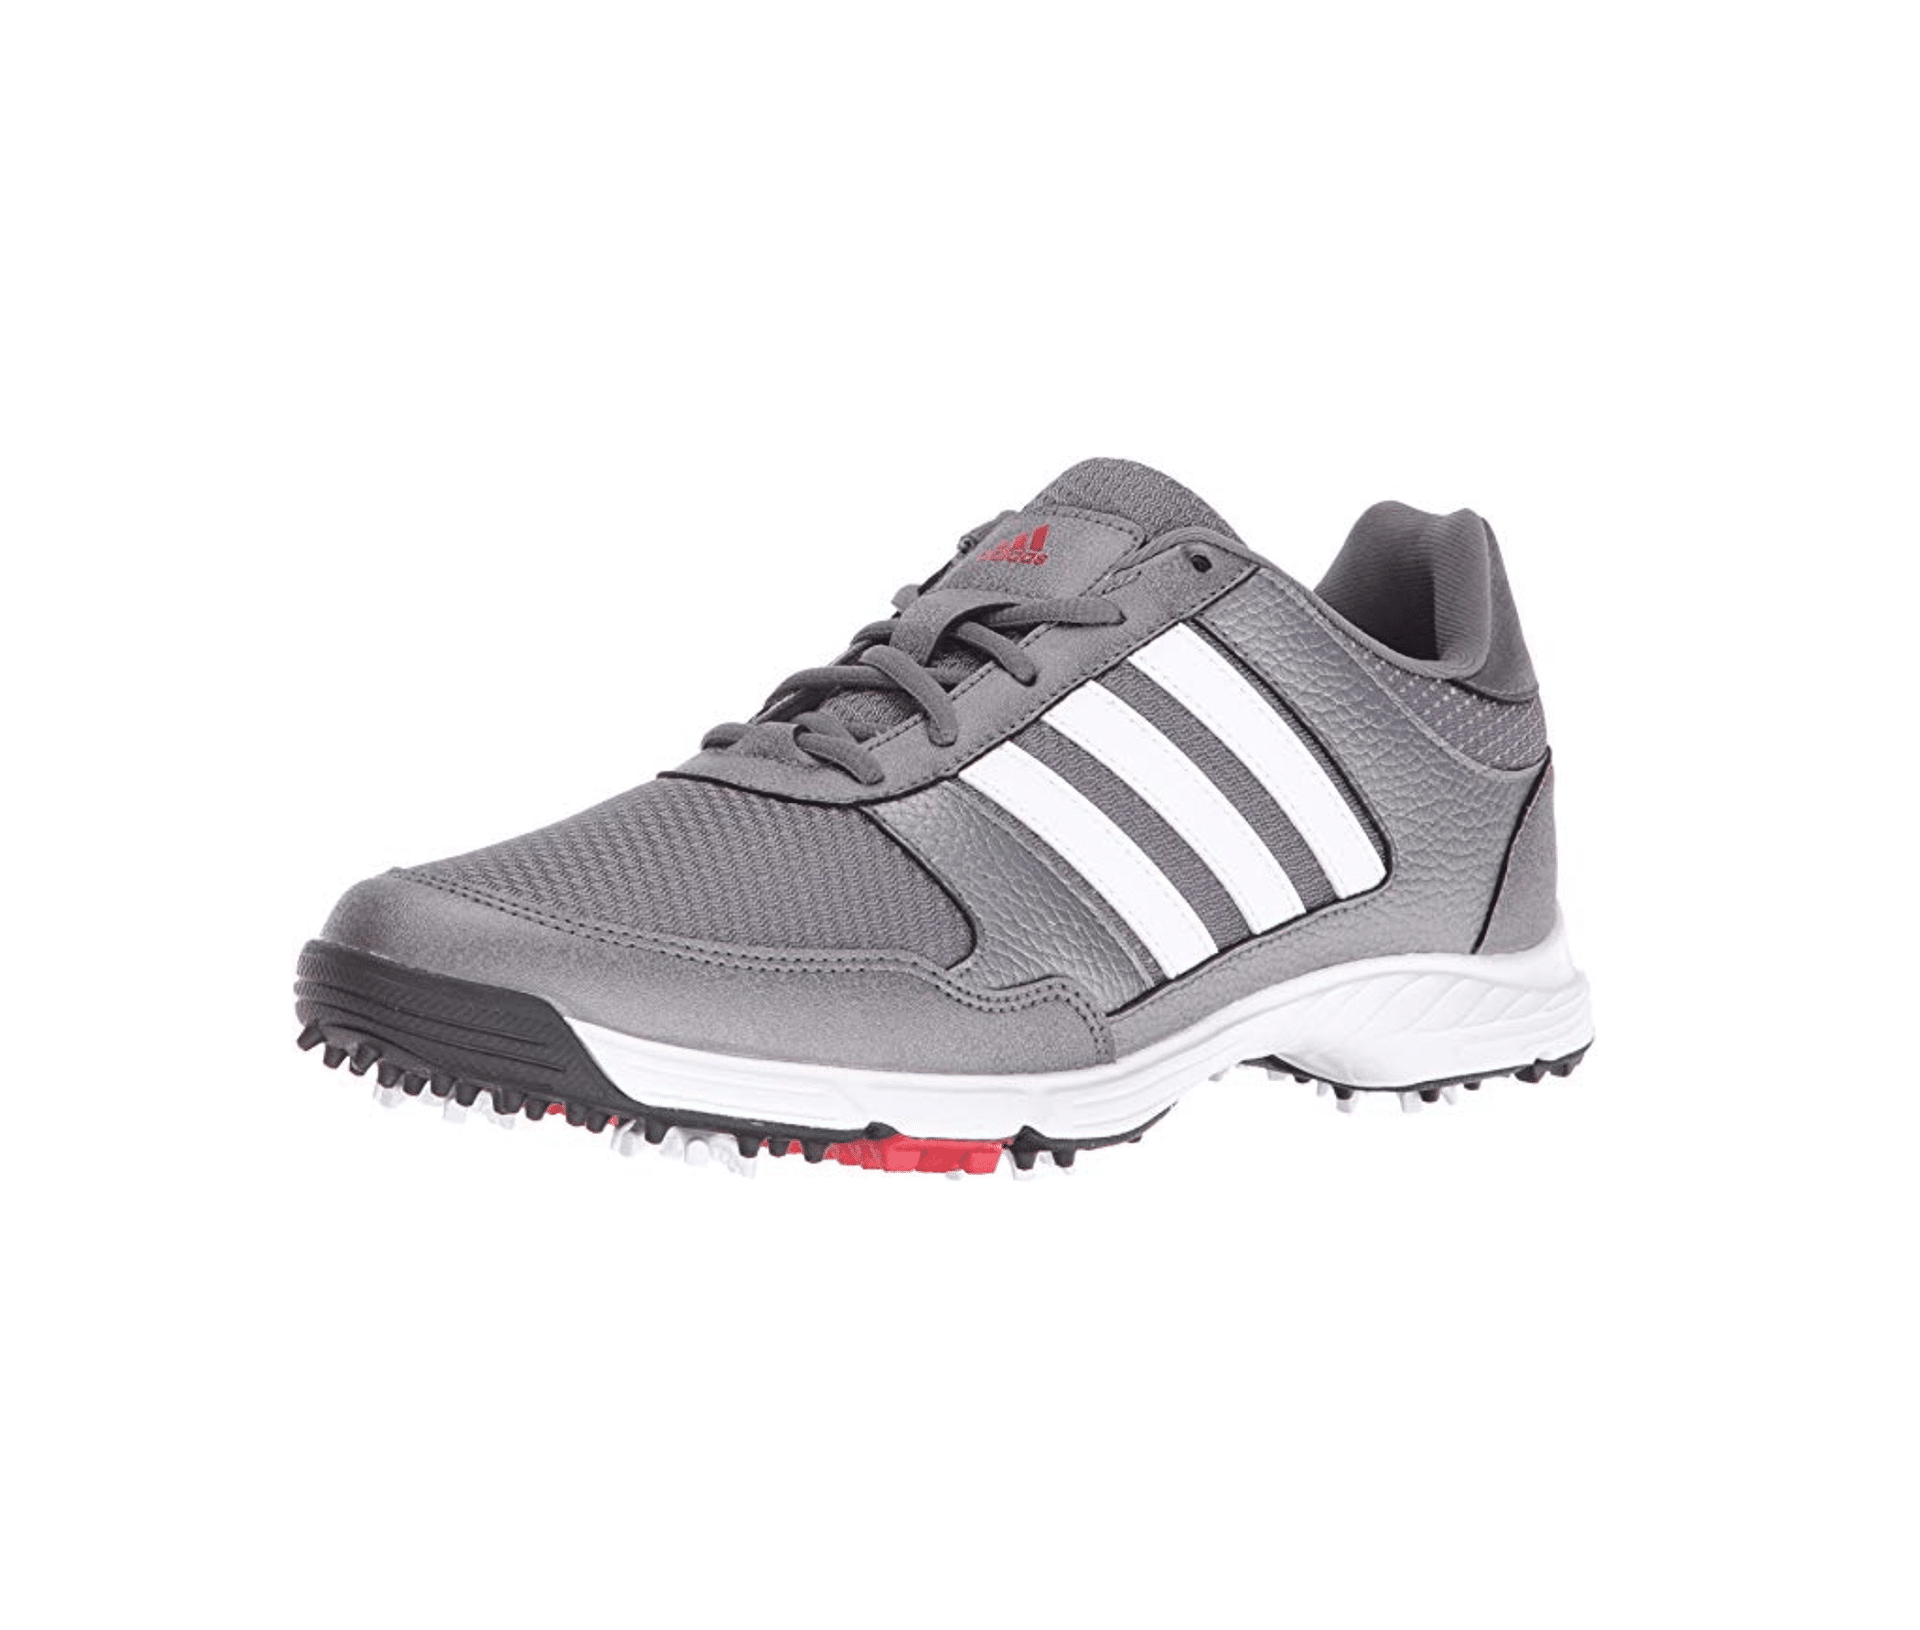 Adidas Men S Tech Response Golf Shoes Review Hack Golf